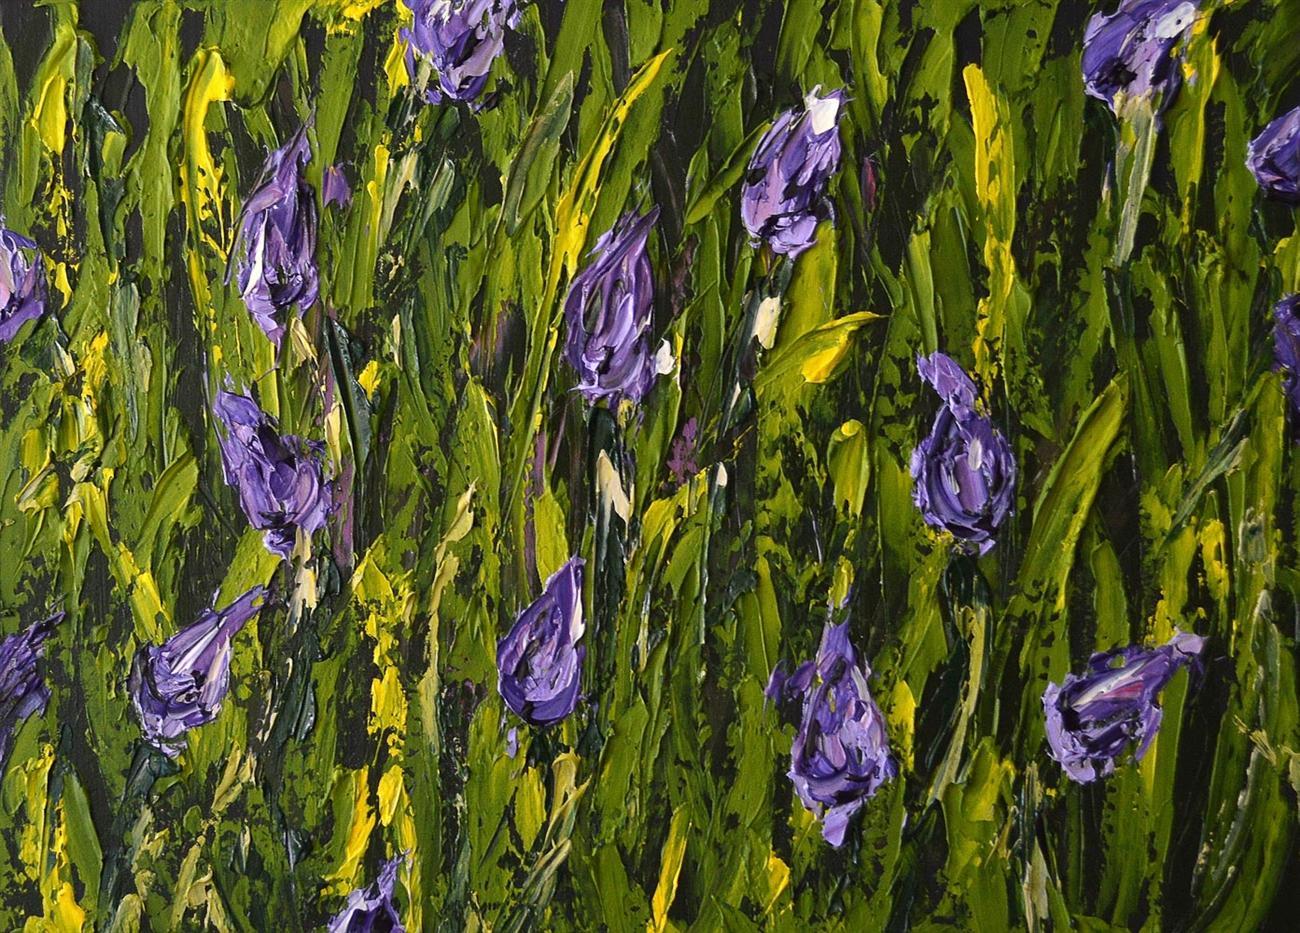 Felicia Aroney Purple Tulips 83X61Cm Acrylic On Black Linen New